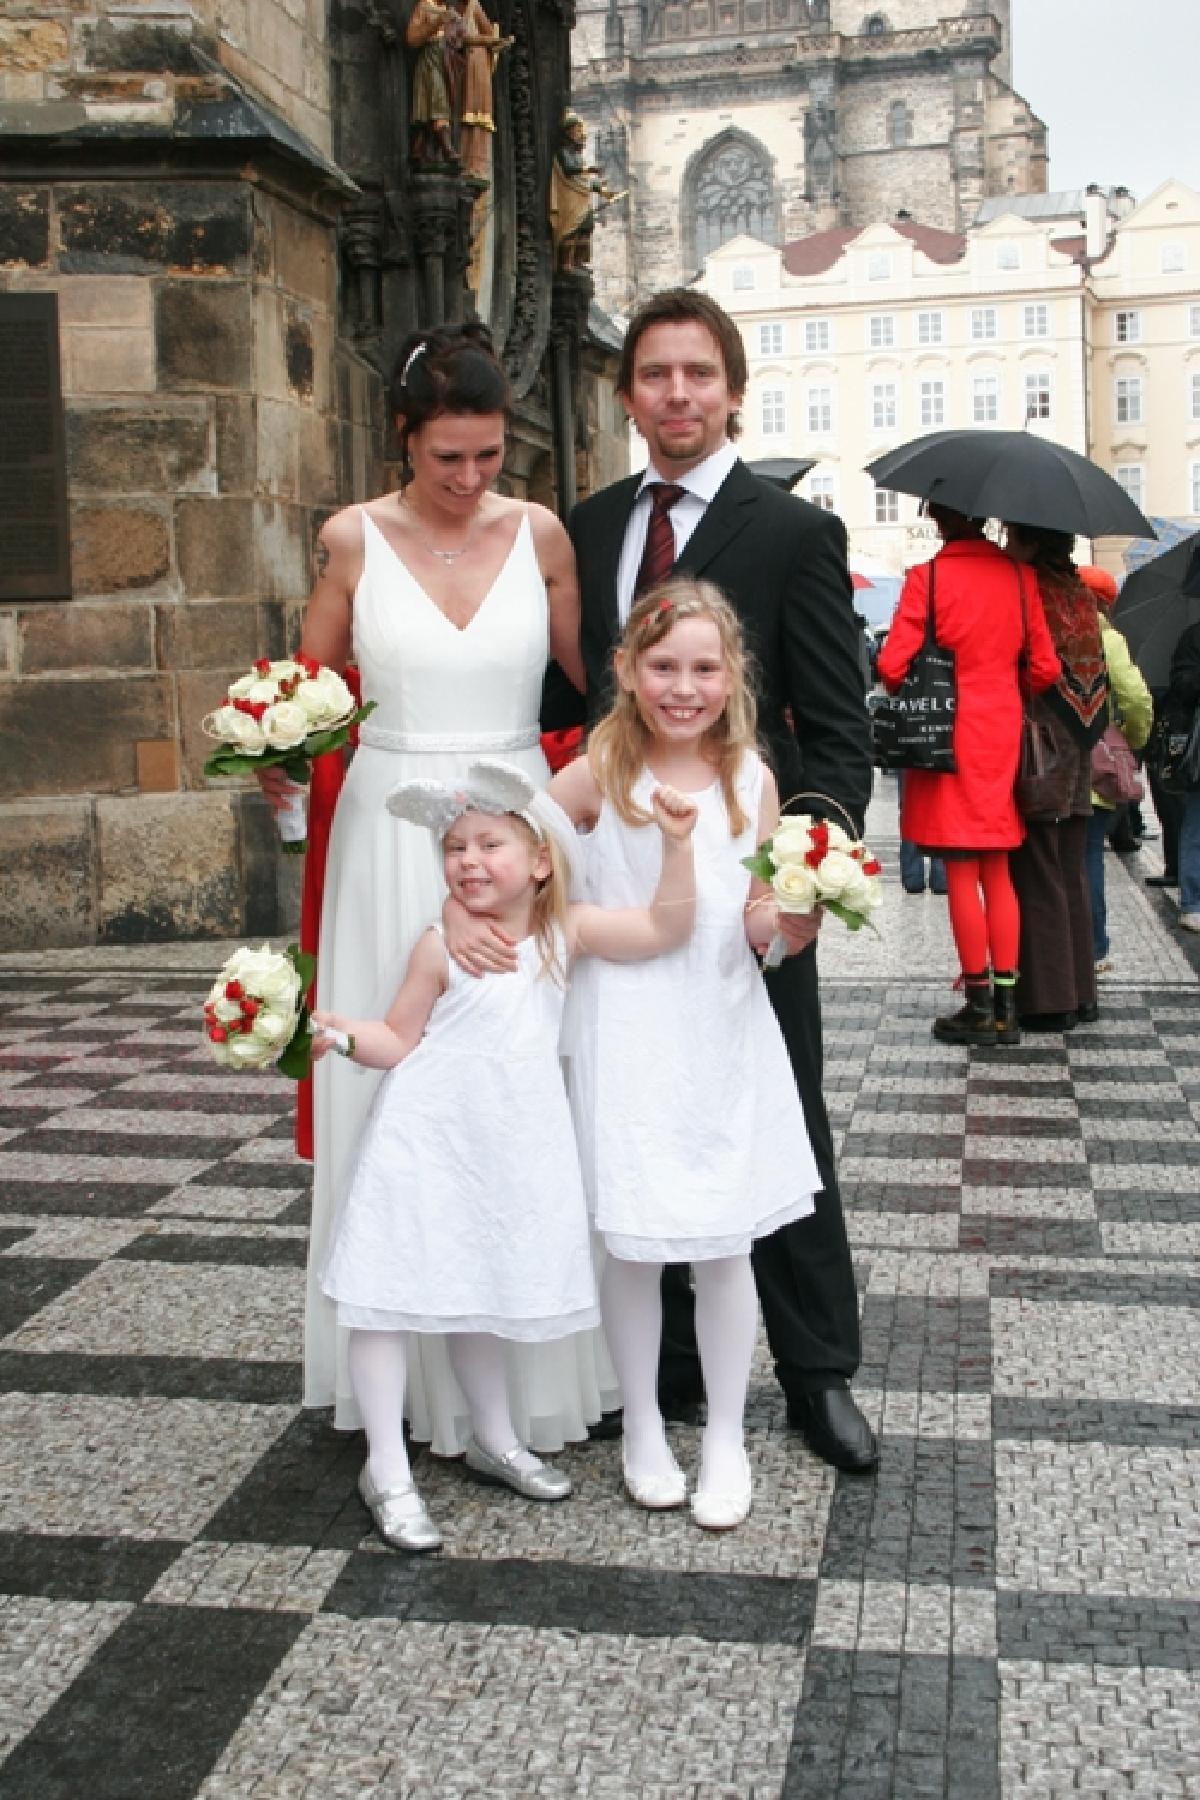 Merethe og Erik, Praha, Tsjekkia, 04. april 2008